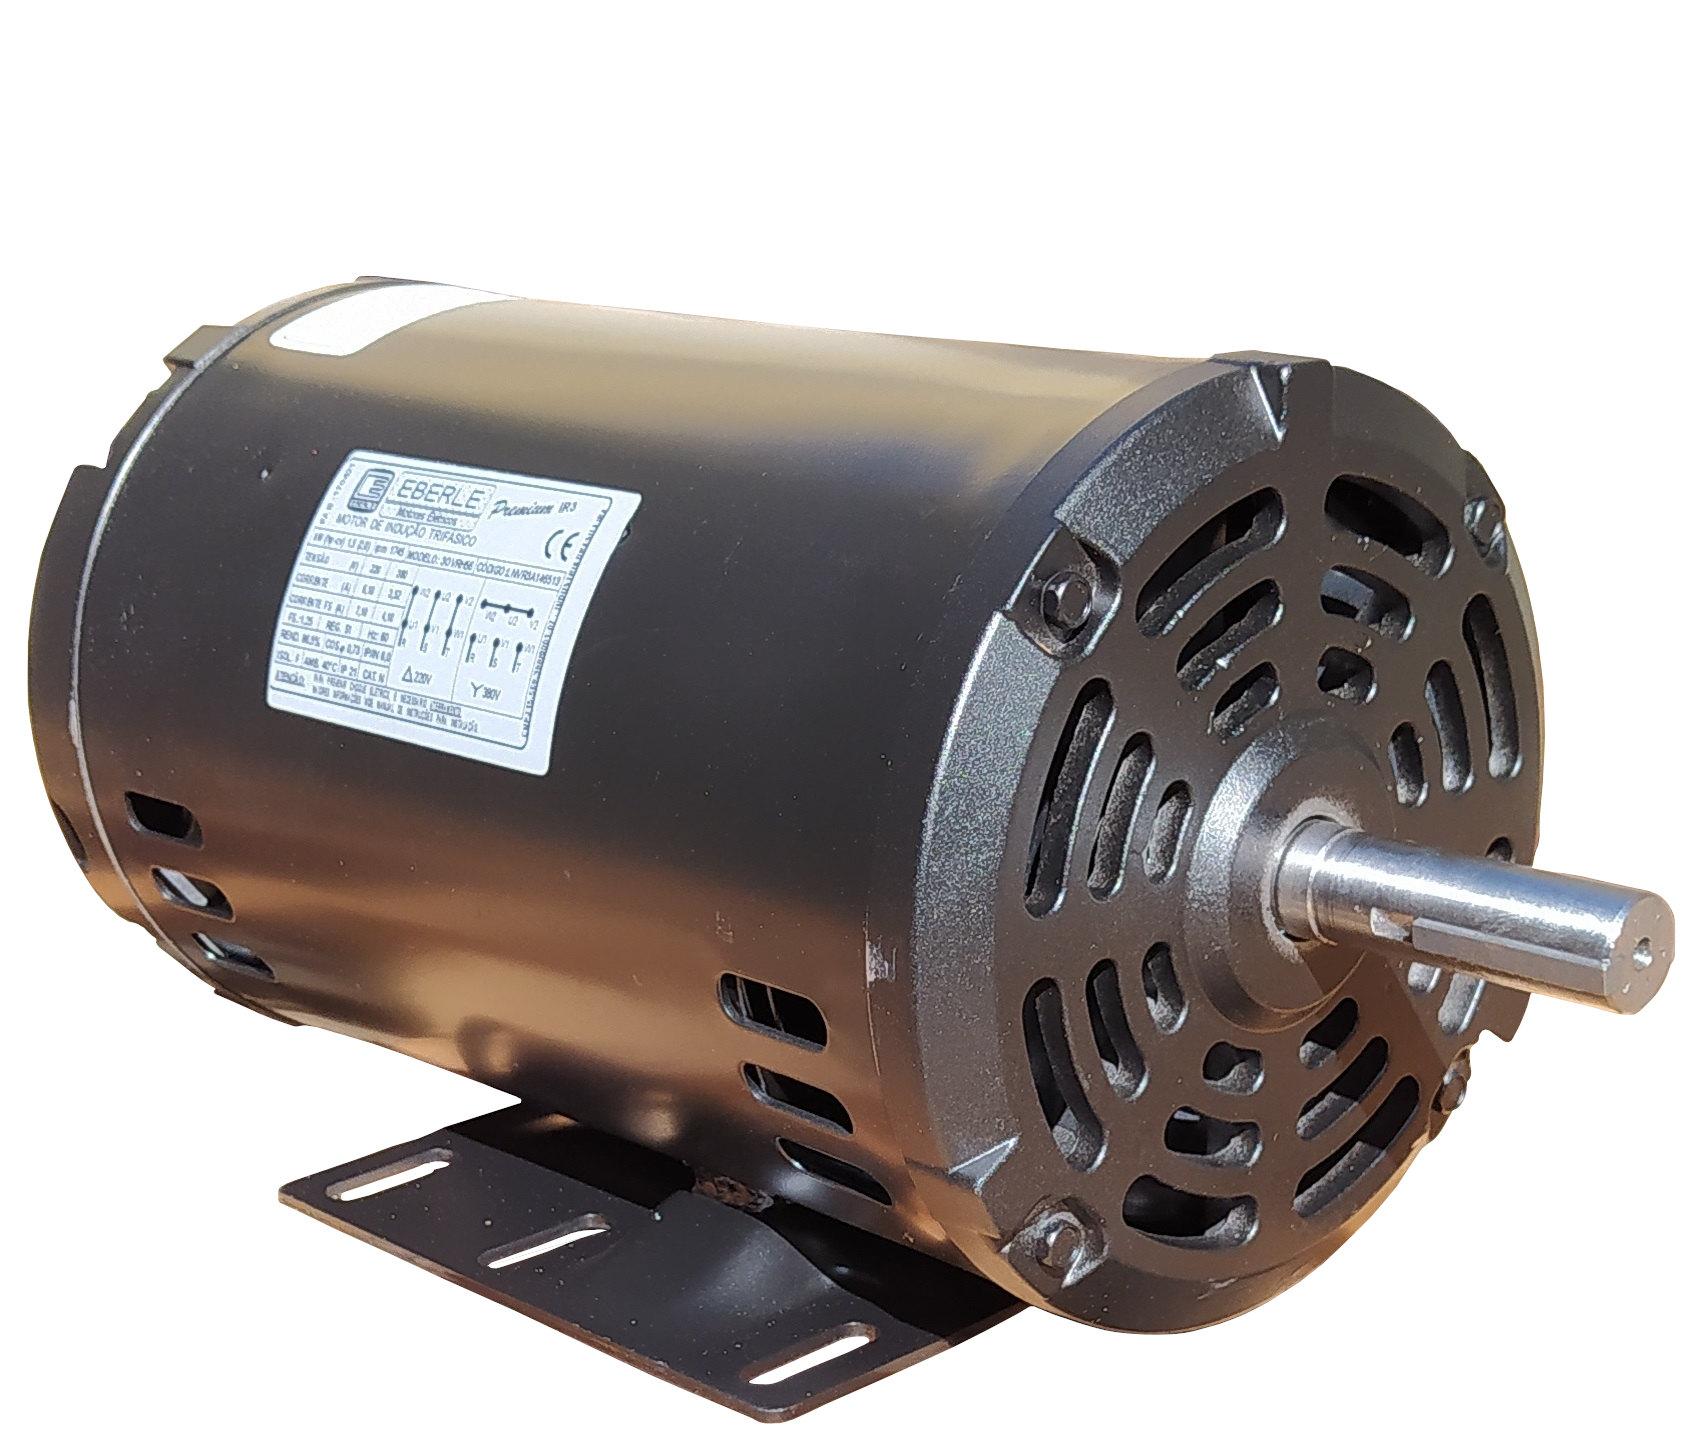 Motor Elétrico Trifásico 2cv 2 Polos Alta Rotação 220/380V Aberto IP21 Eberle Mercosul IR3